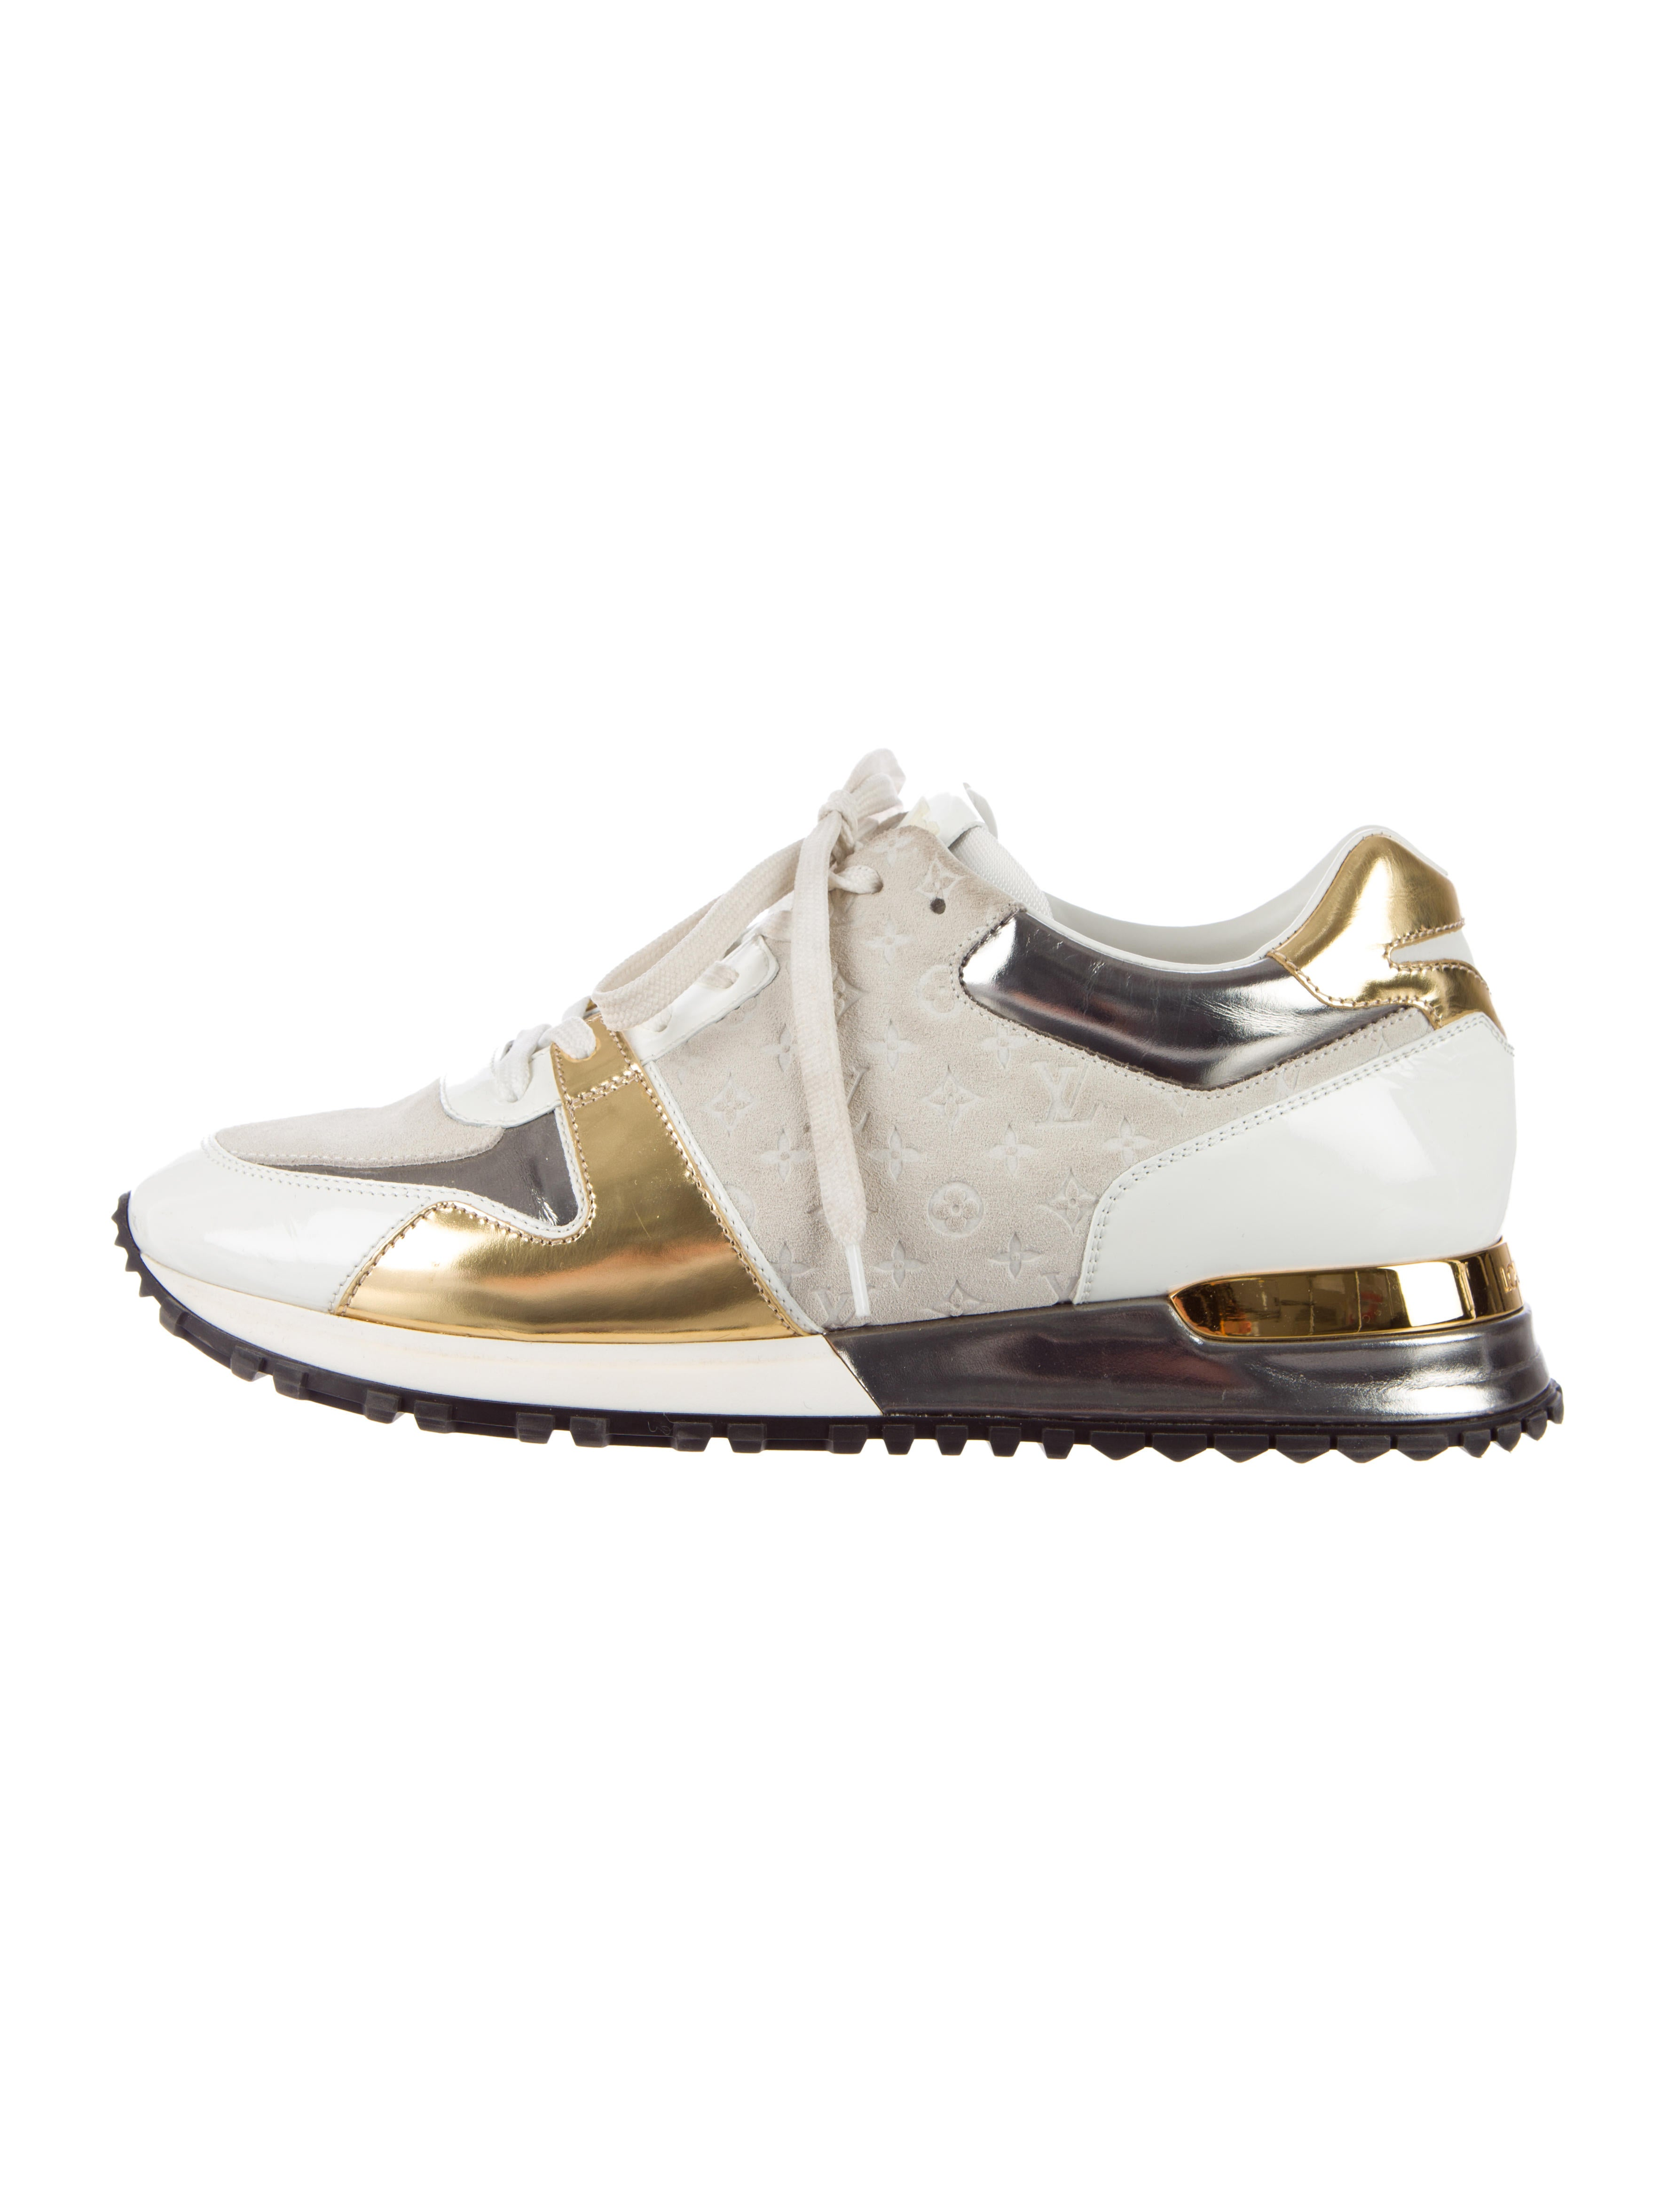 7bd6a48a4a2d Louis Vuitton Run Away Sneakers - Shoes - LOU53580